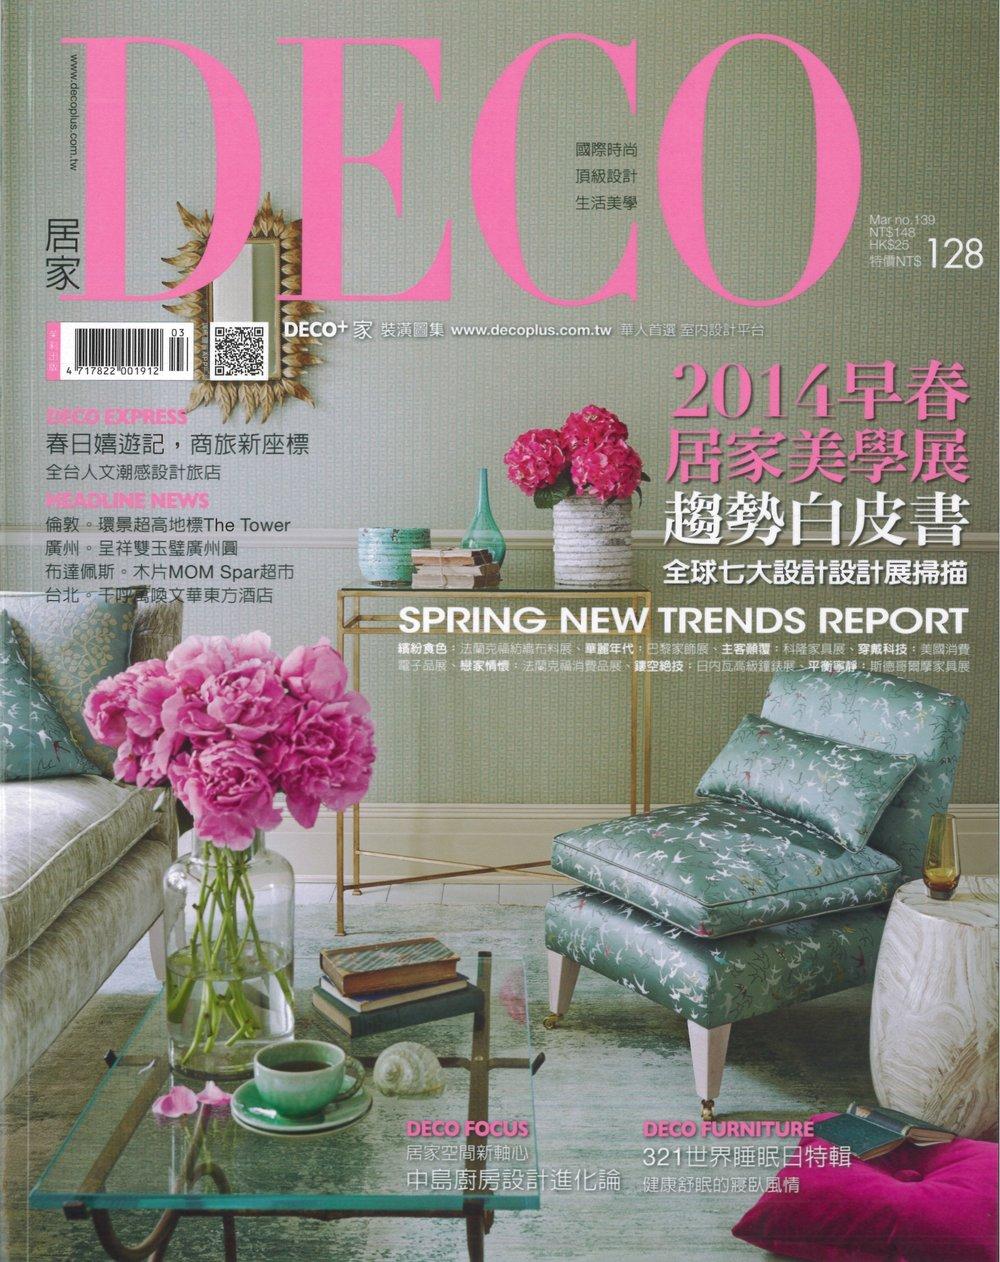 201403_Deco_Cover.jpg